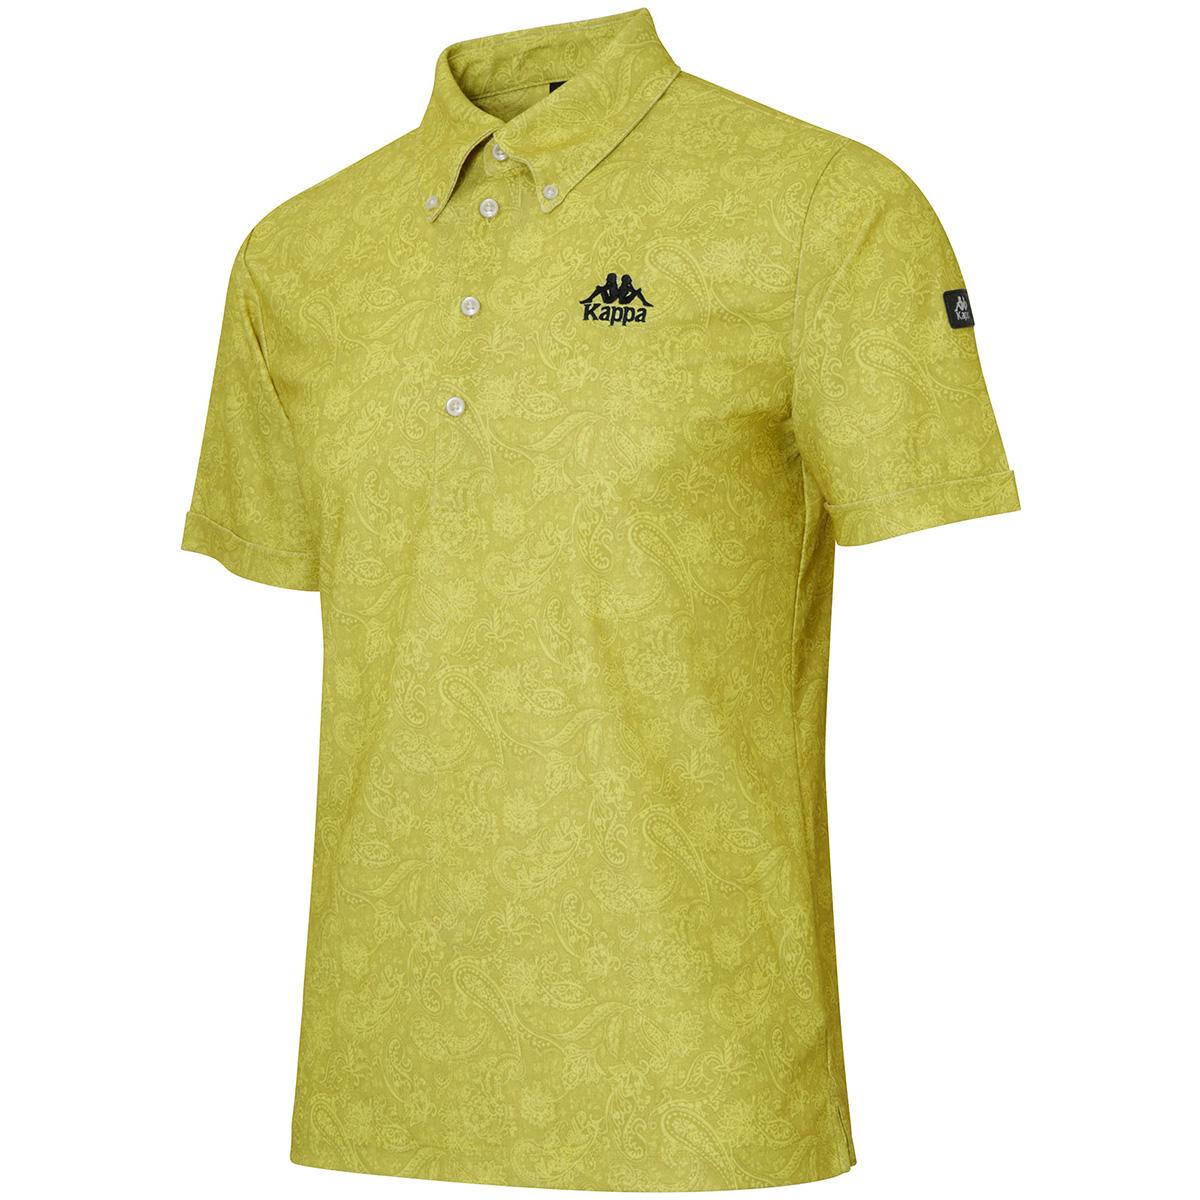 Kappa GOLF ペイズリープリント半袖ポロシャツ